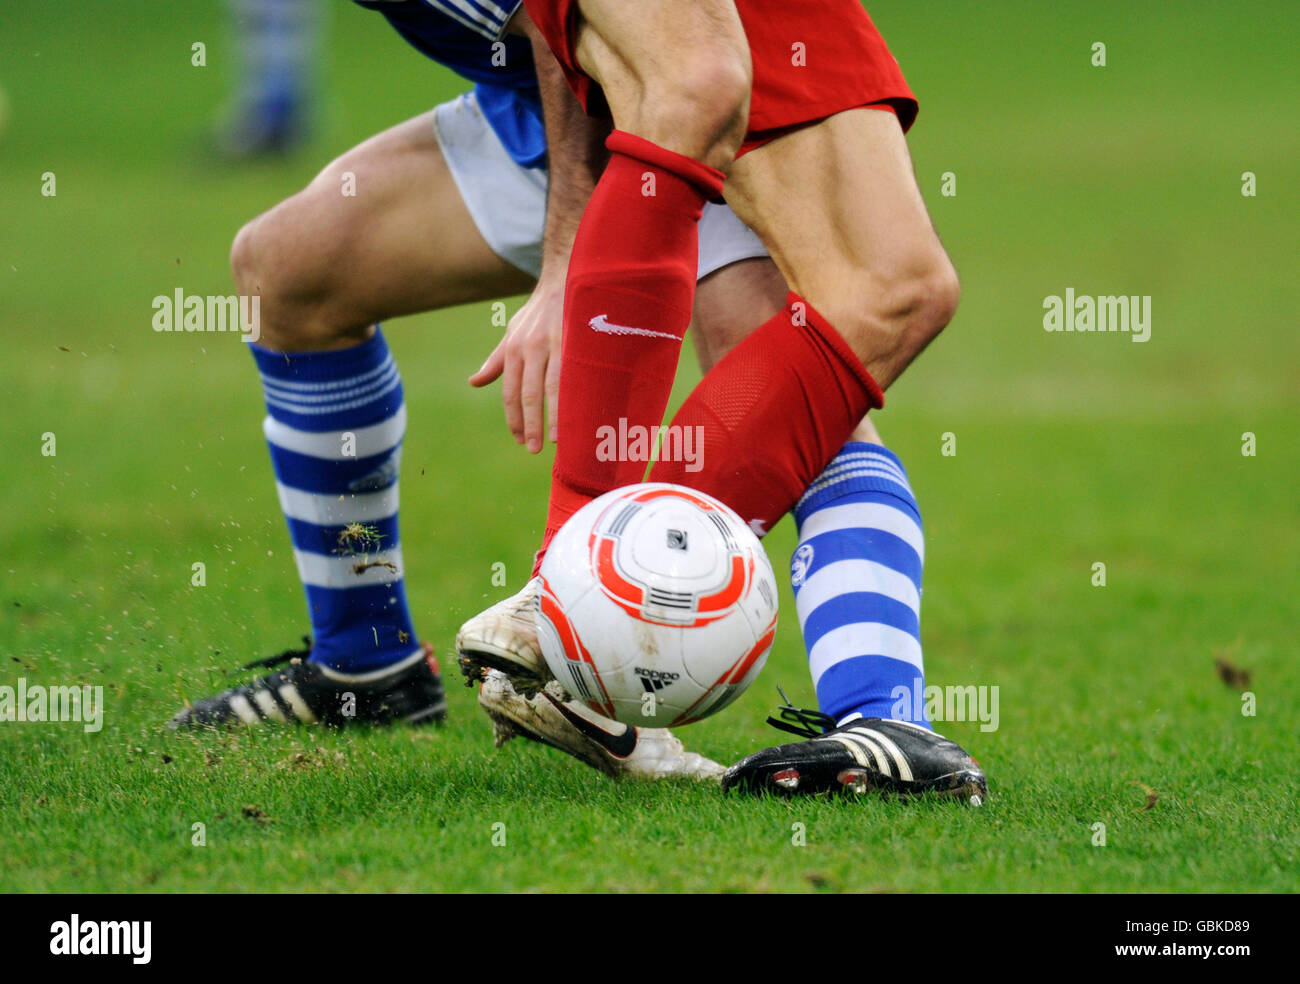 Players legs in a battle for the ball, FC Schalke 04, S04 - SC Freiburg 1-0, Bundesliga federal league, Veltins - Stock Image